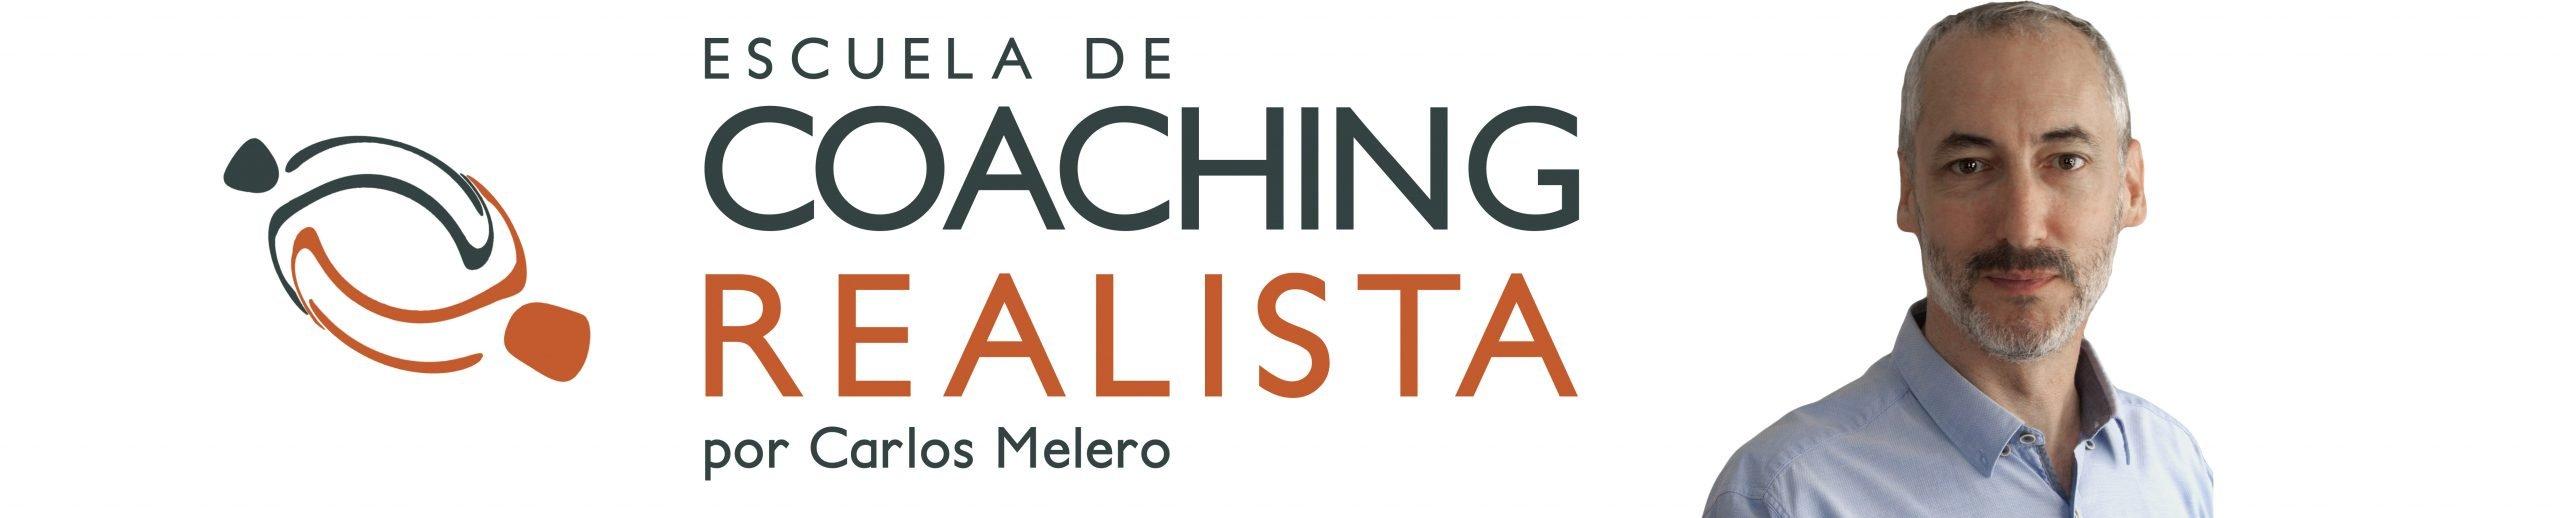 ECR Carlos Melero 2020 08